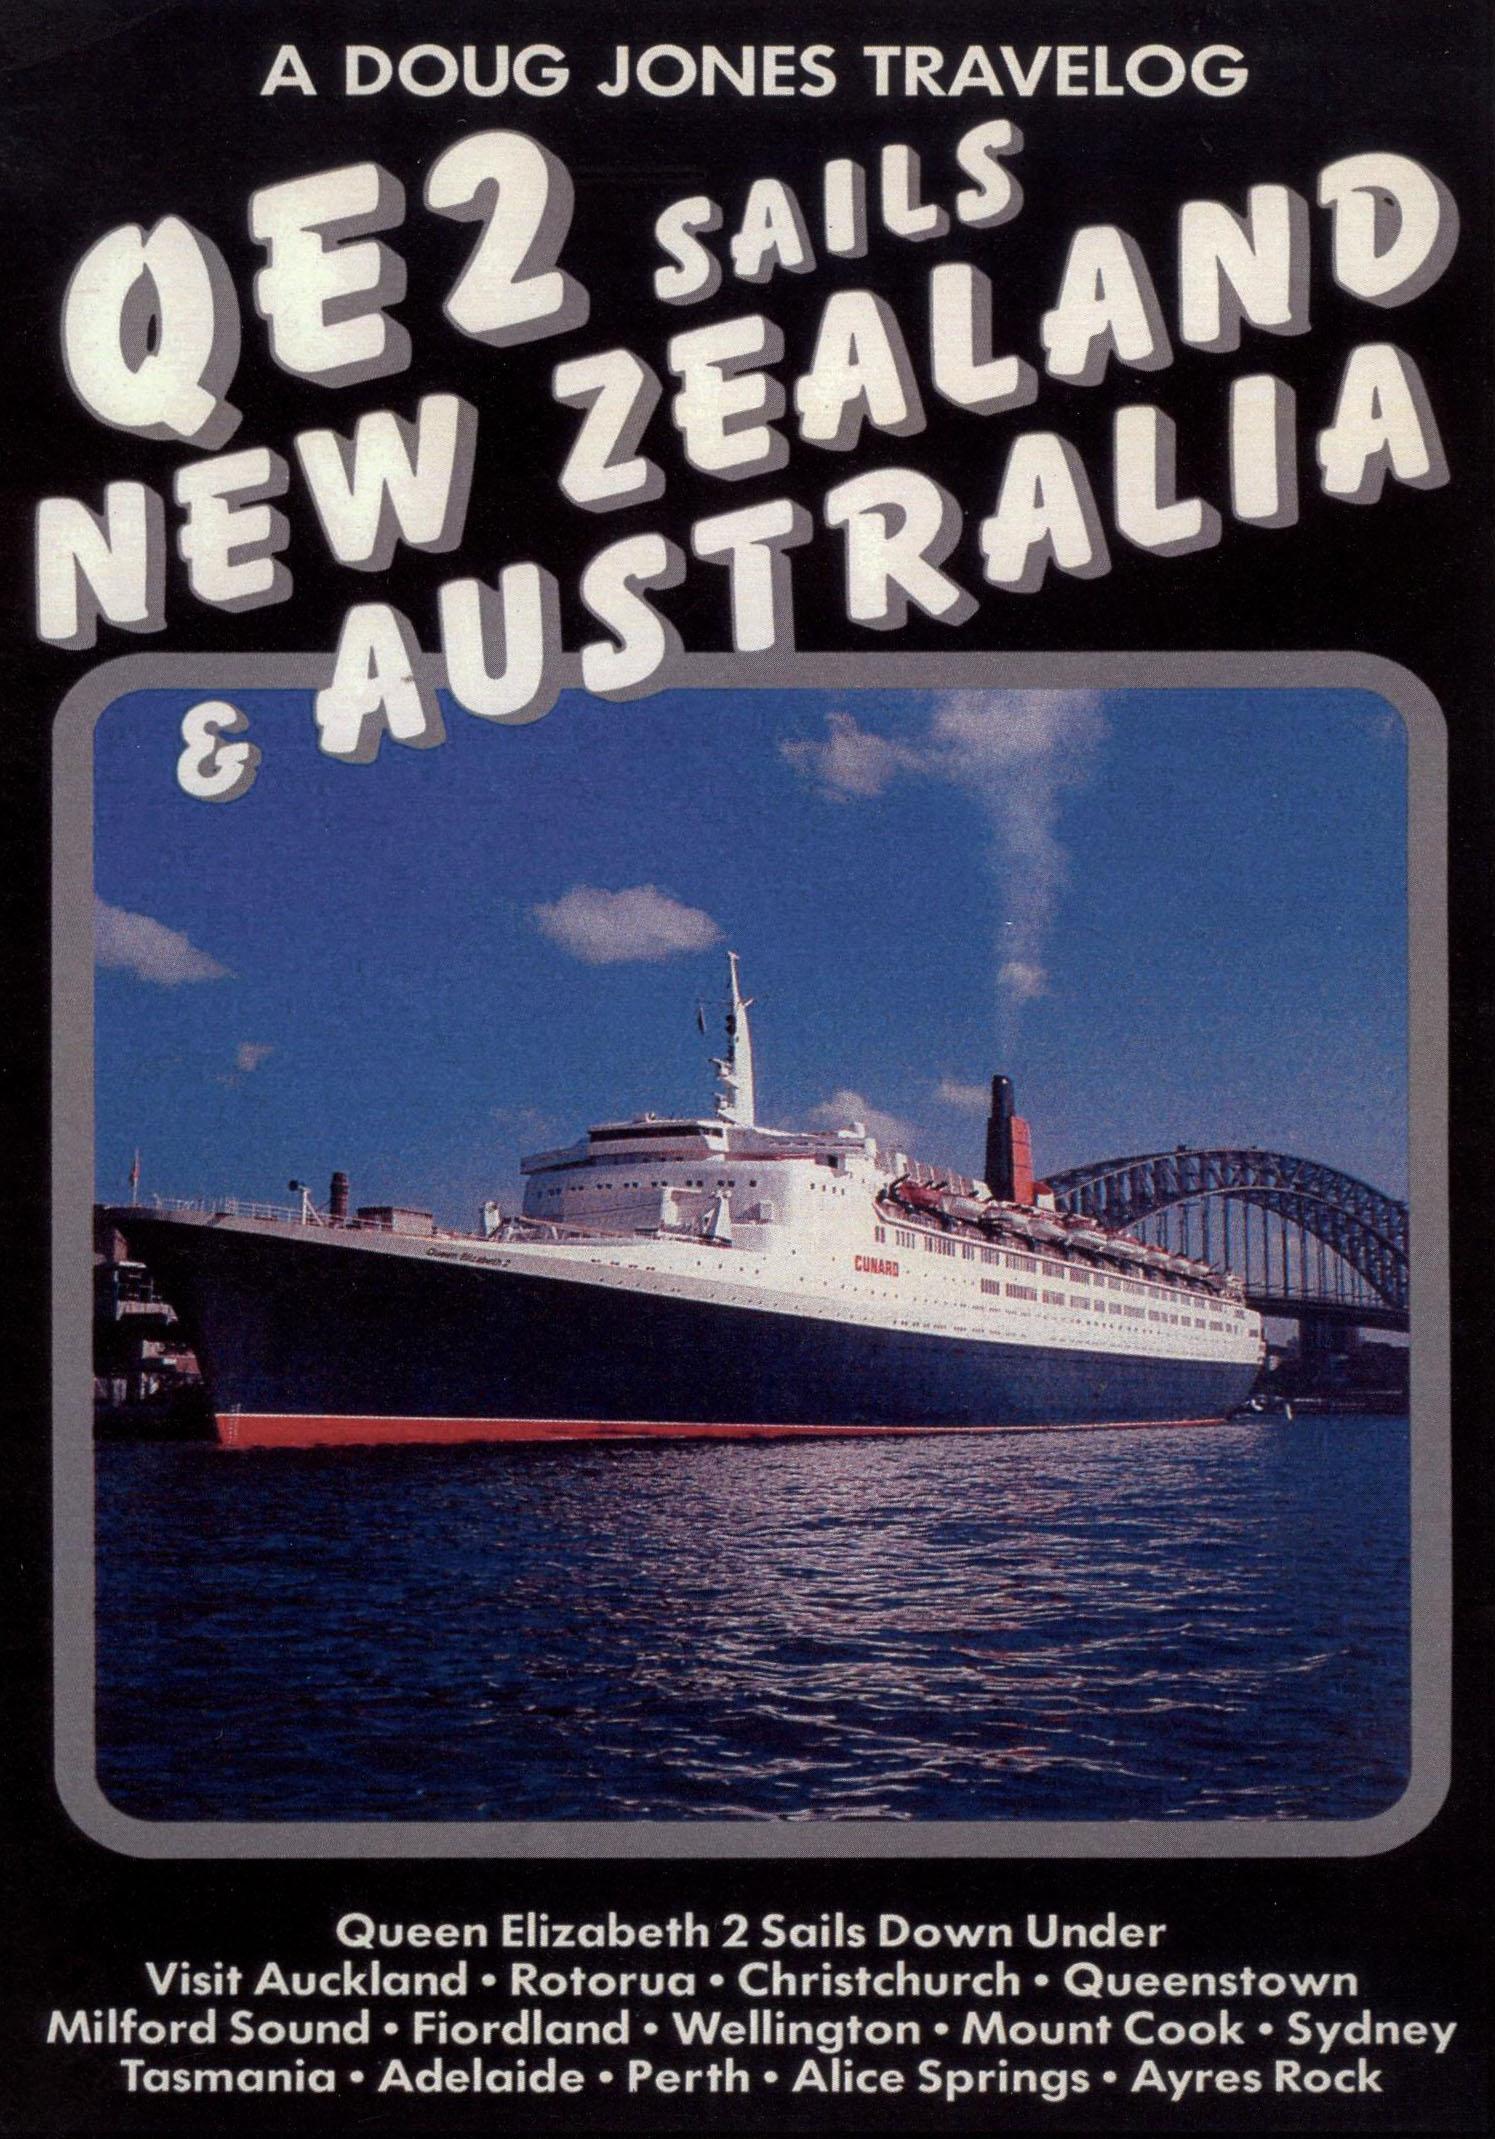 QE2 Sails New Zealand & Australia